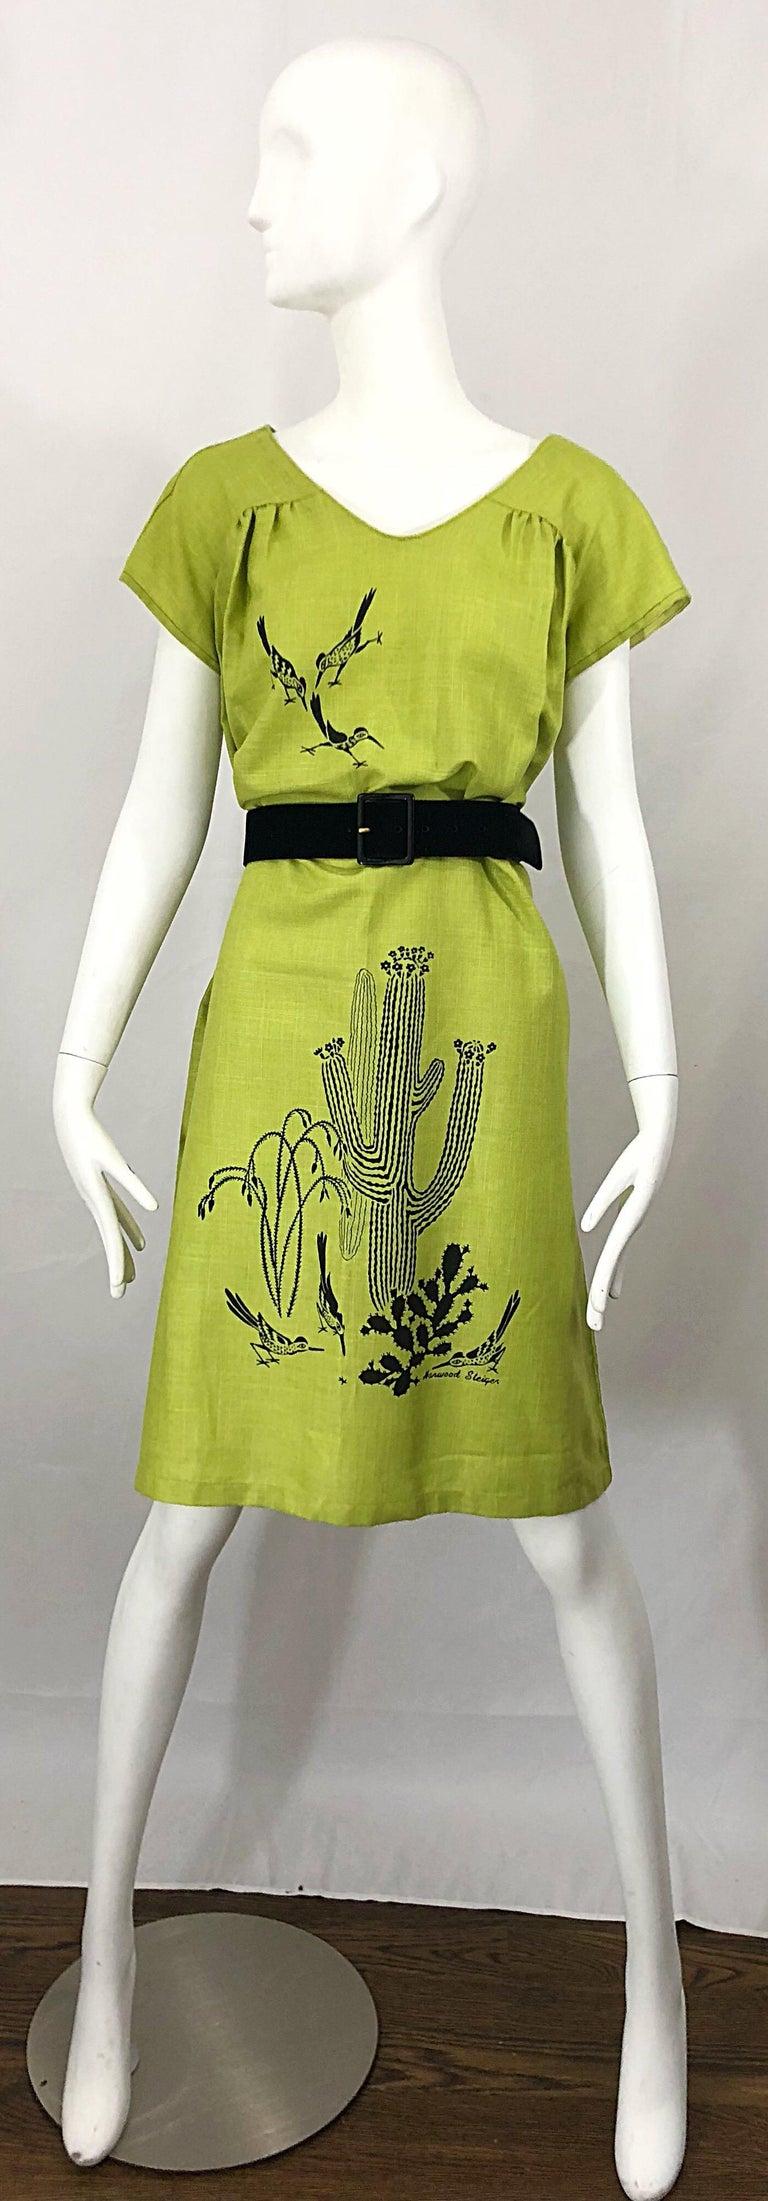 Rare 1970s Harwood Steiger Screen Printed Ant Eater Novelty Linen Tunic Dress For Sale 7